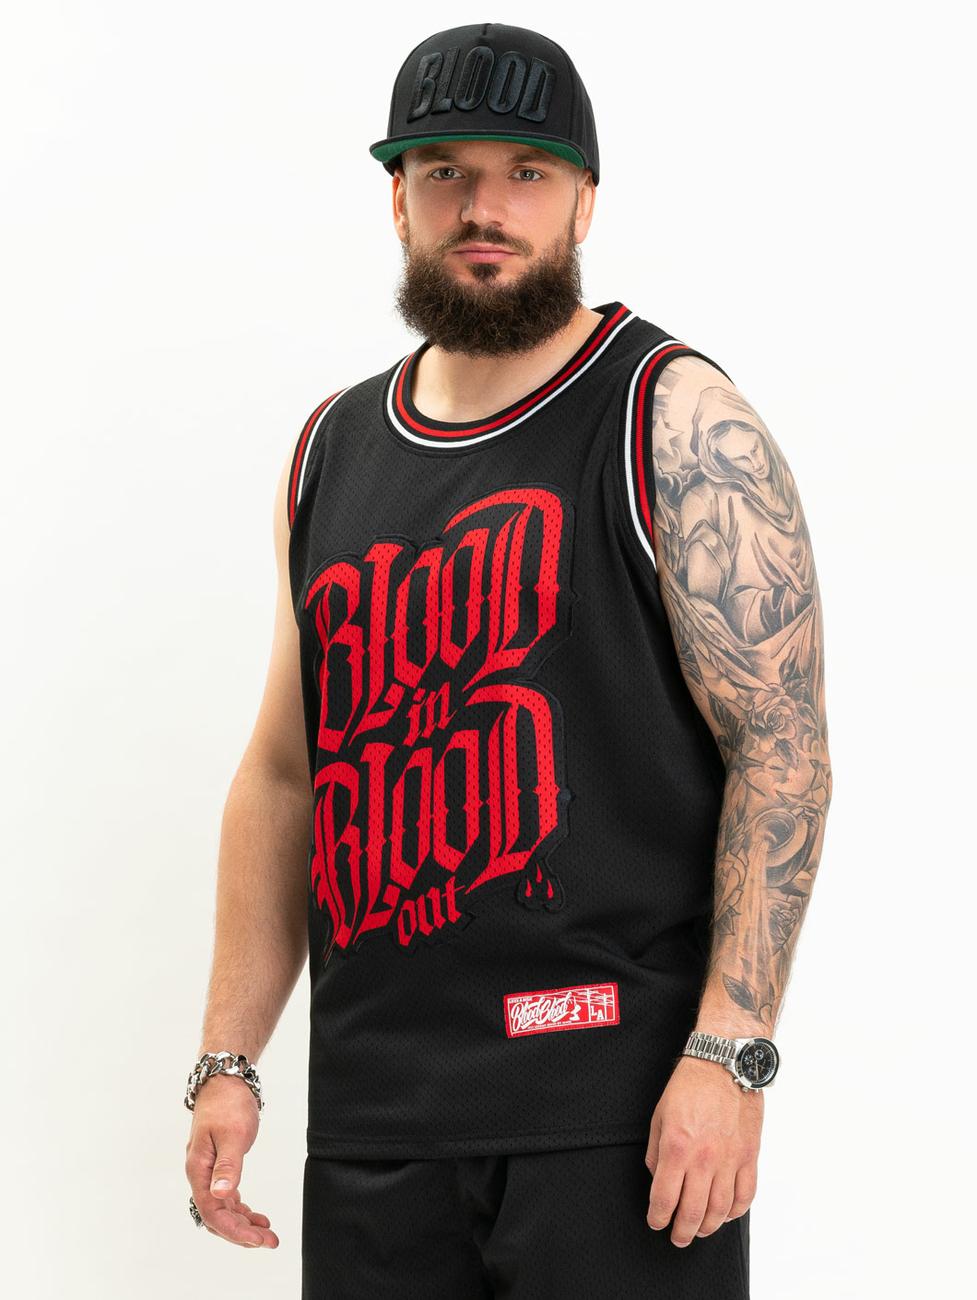 Blood In Blood Out Aguas Mesh Tanktop 2XL